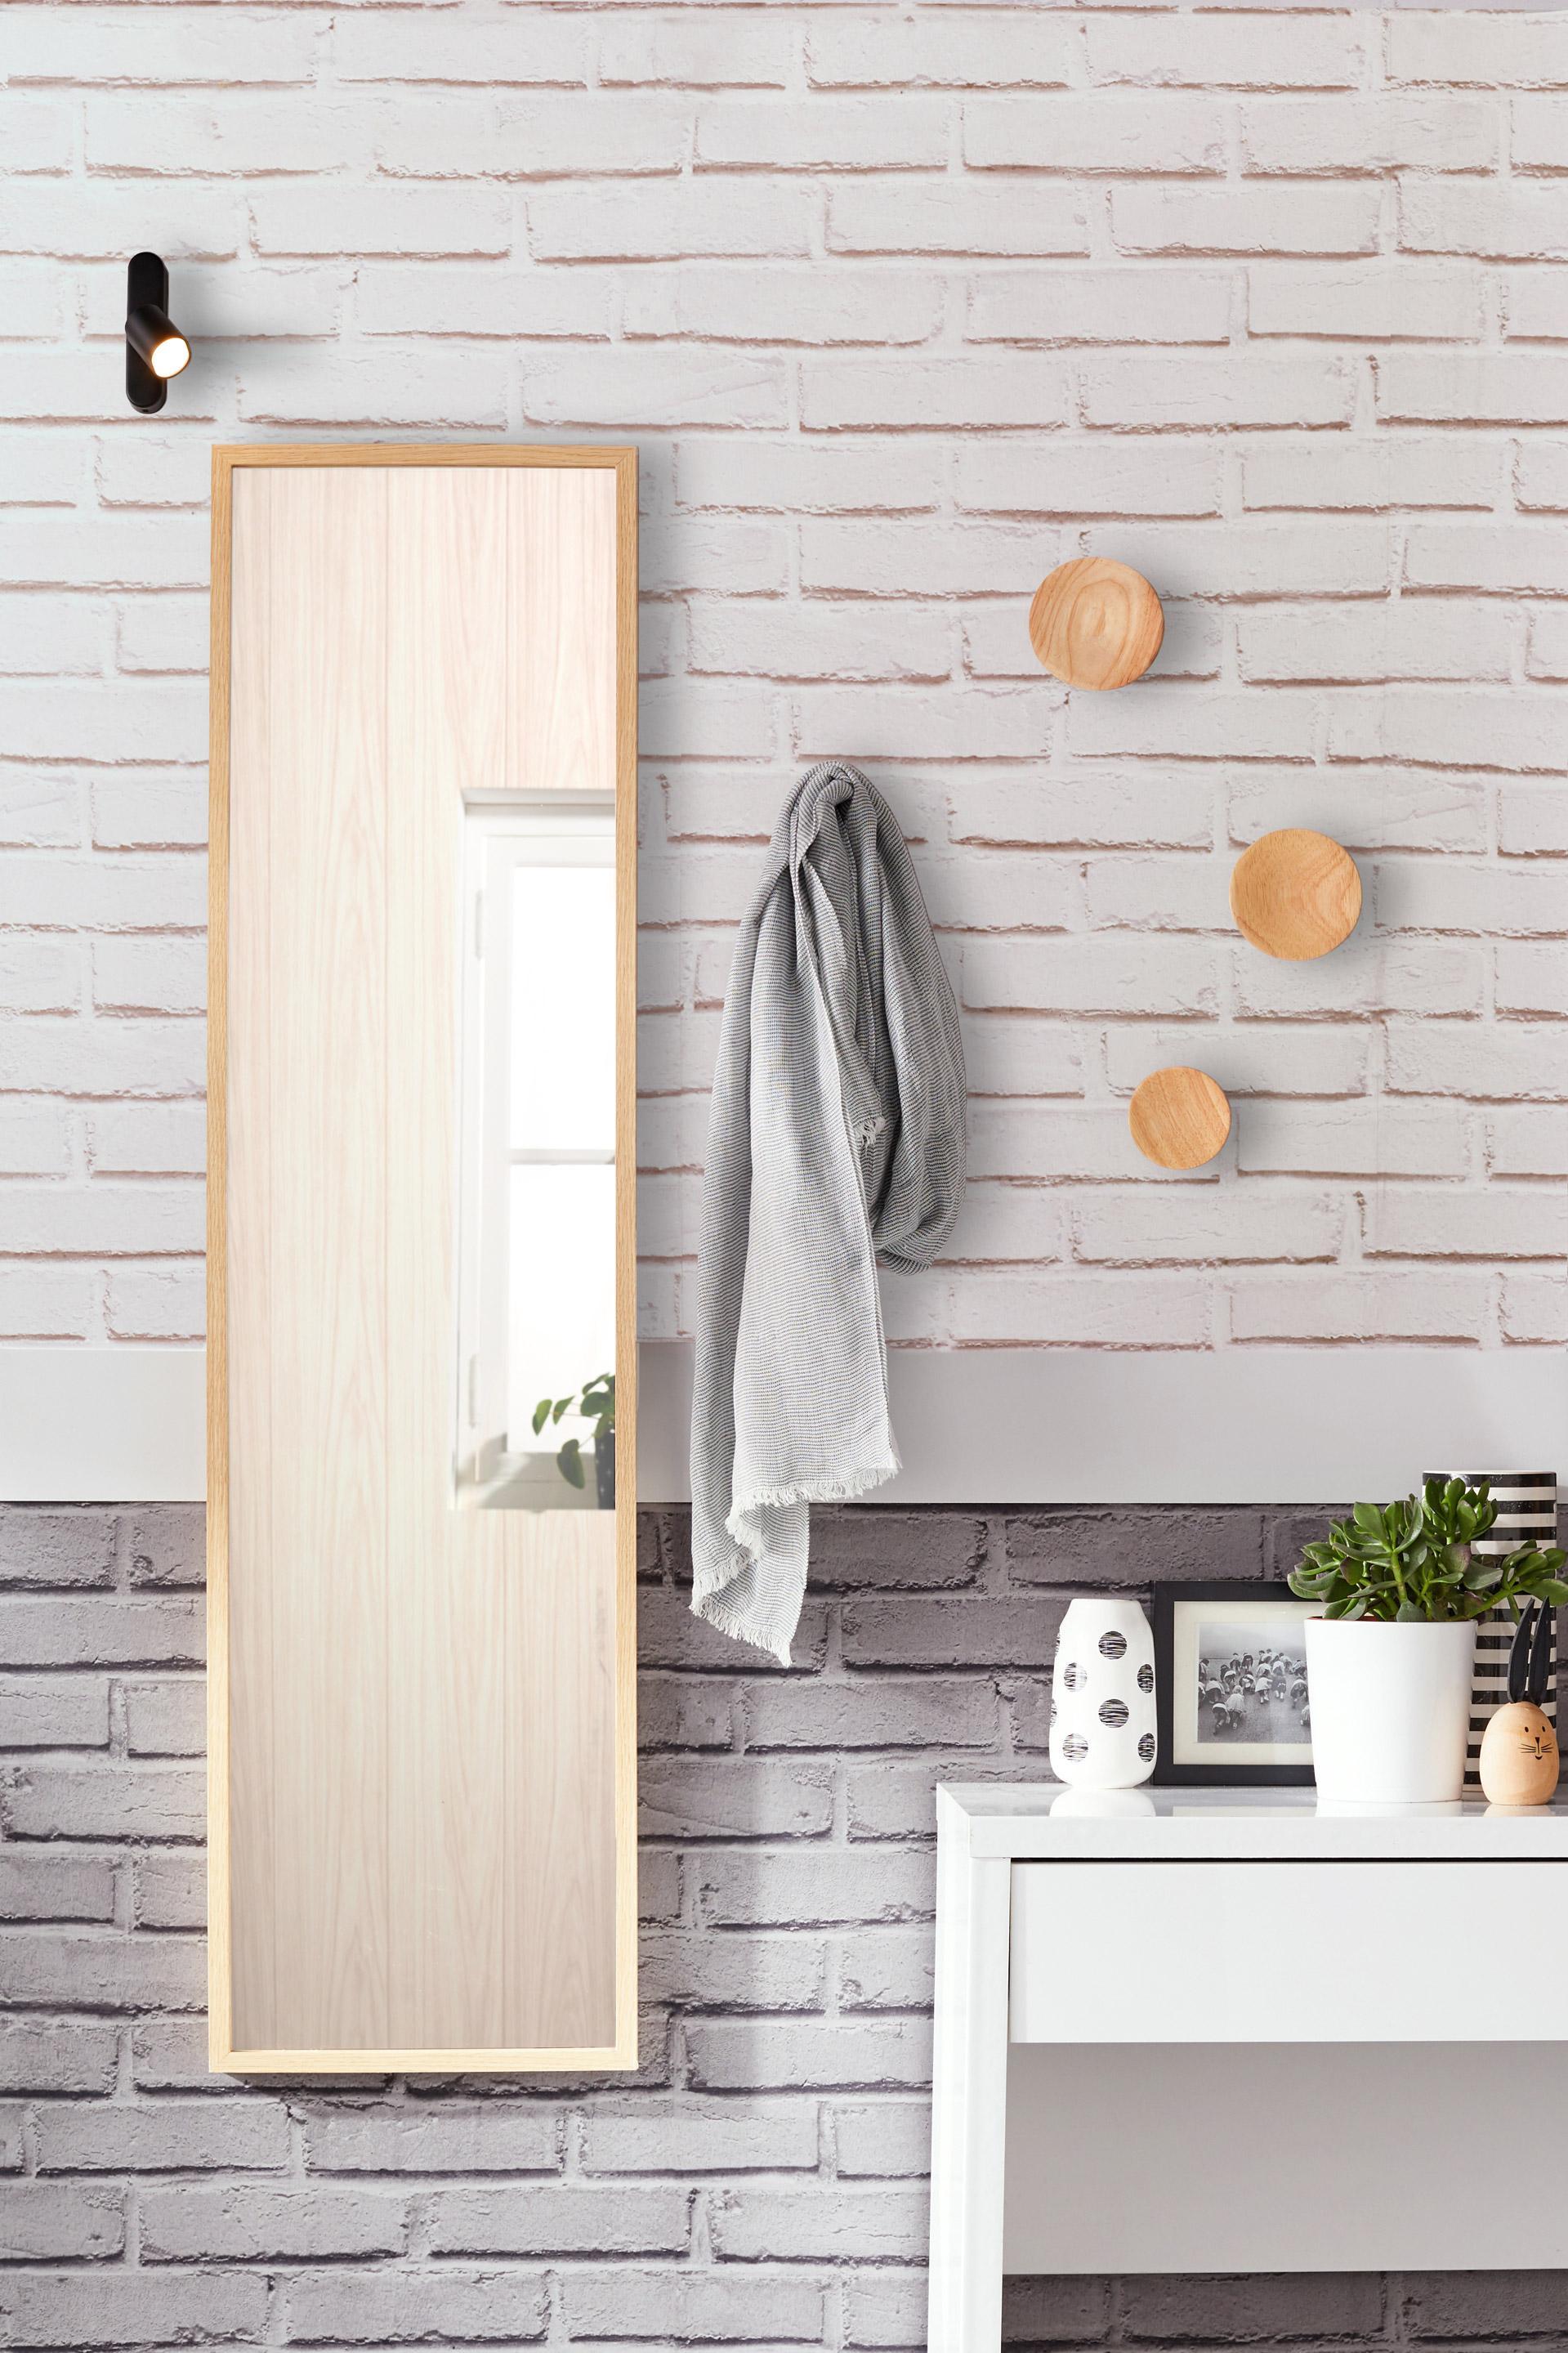 Miroir Milo INSPIRE, chêne, l.30 x H.120 cm